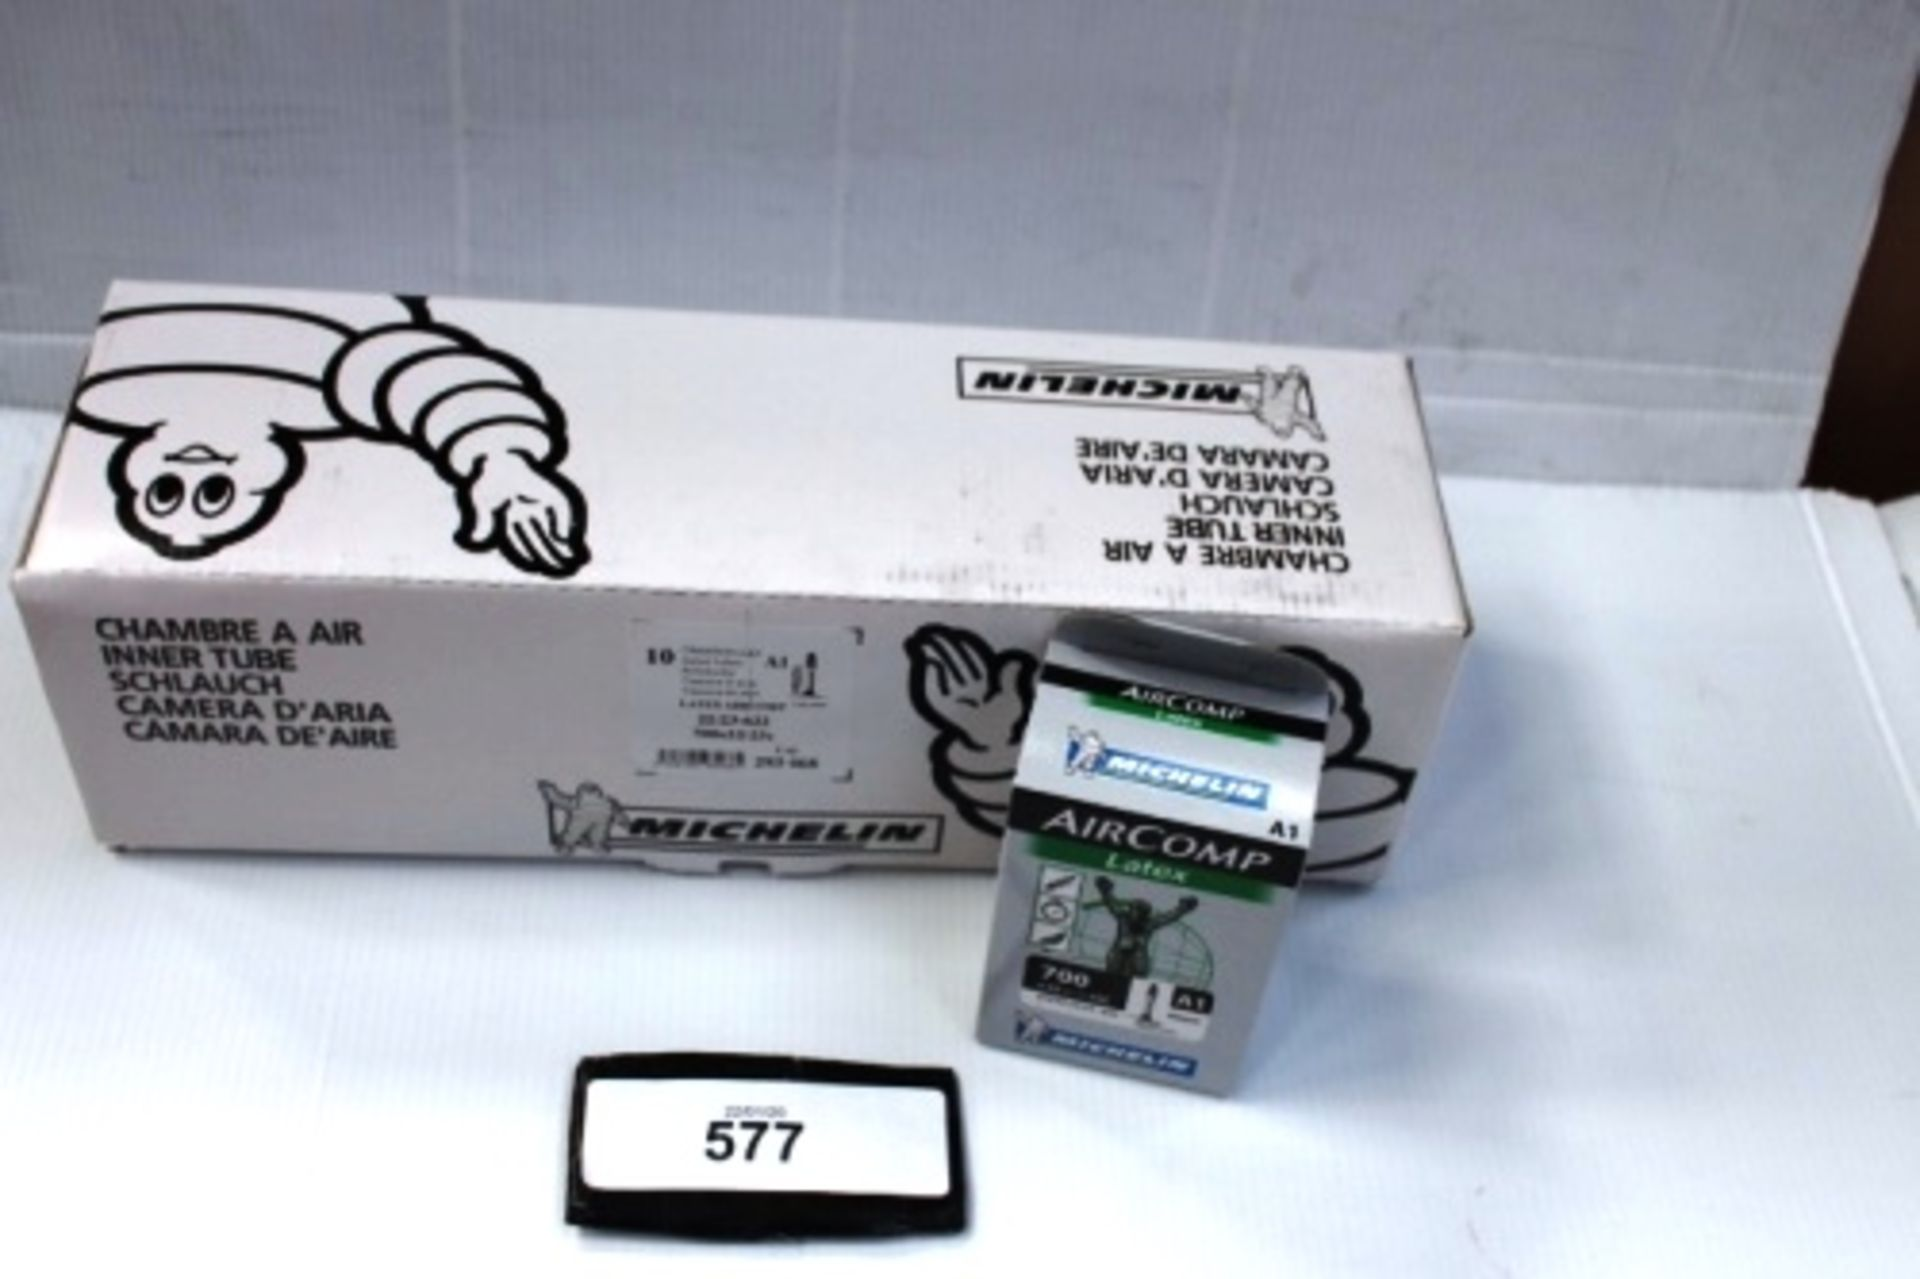 Lot 577 - 10 x Michelin Air Comp Latex 60mm 700 x 22/23C inner tubes - New in box (ES13)